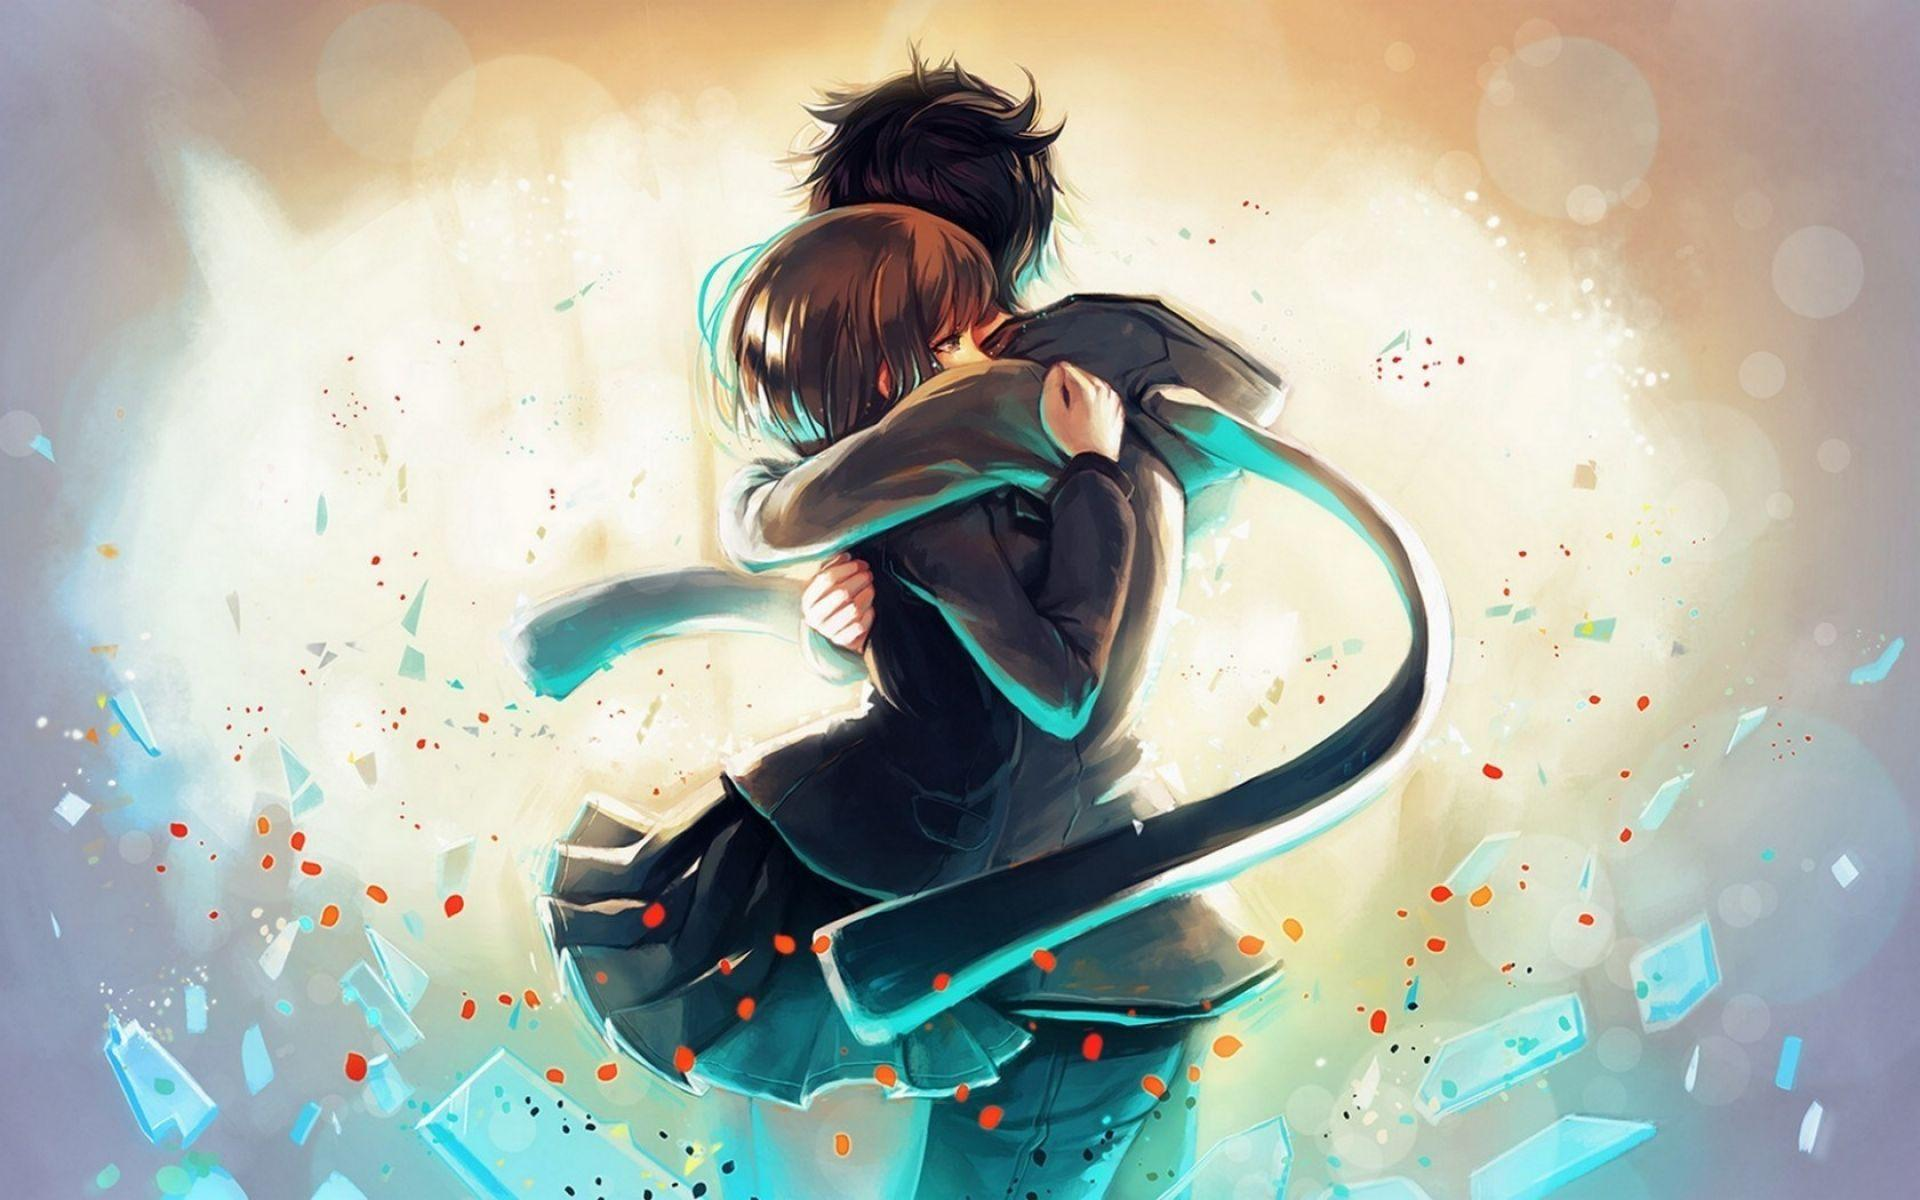 Anime girl boy hug love art wallpaper hd anime wallpapers for